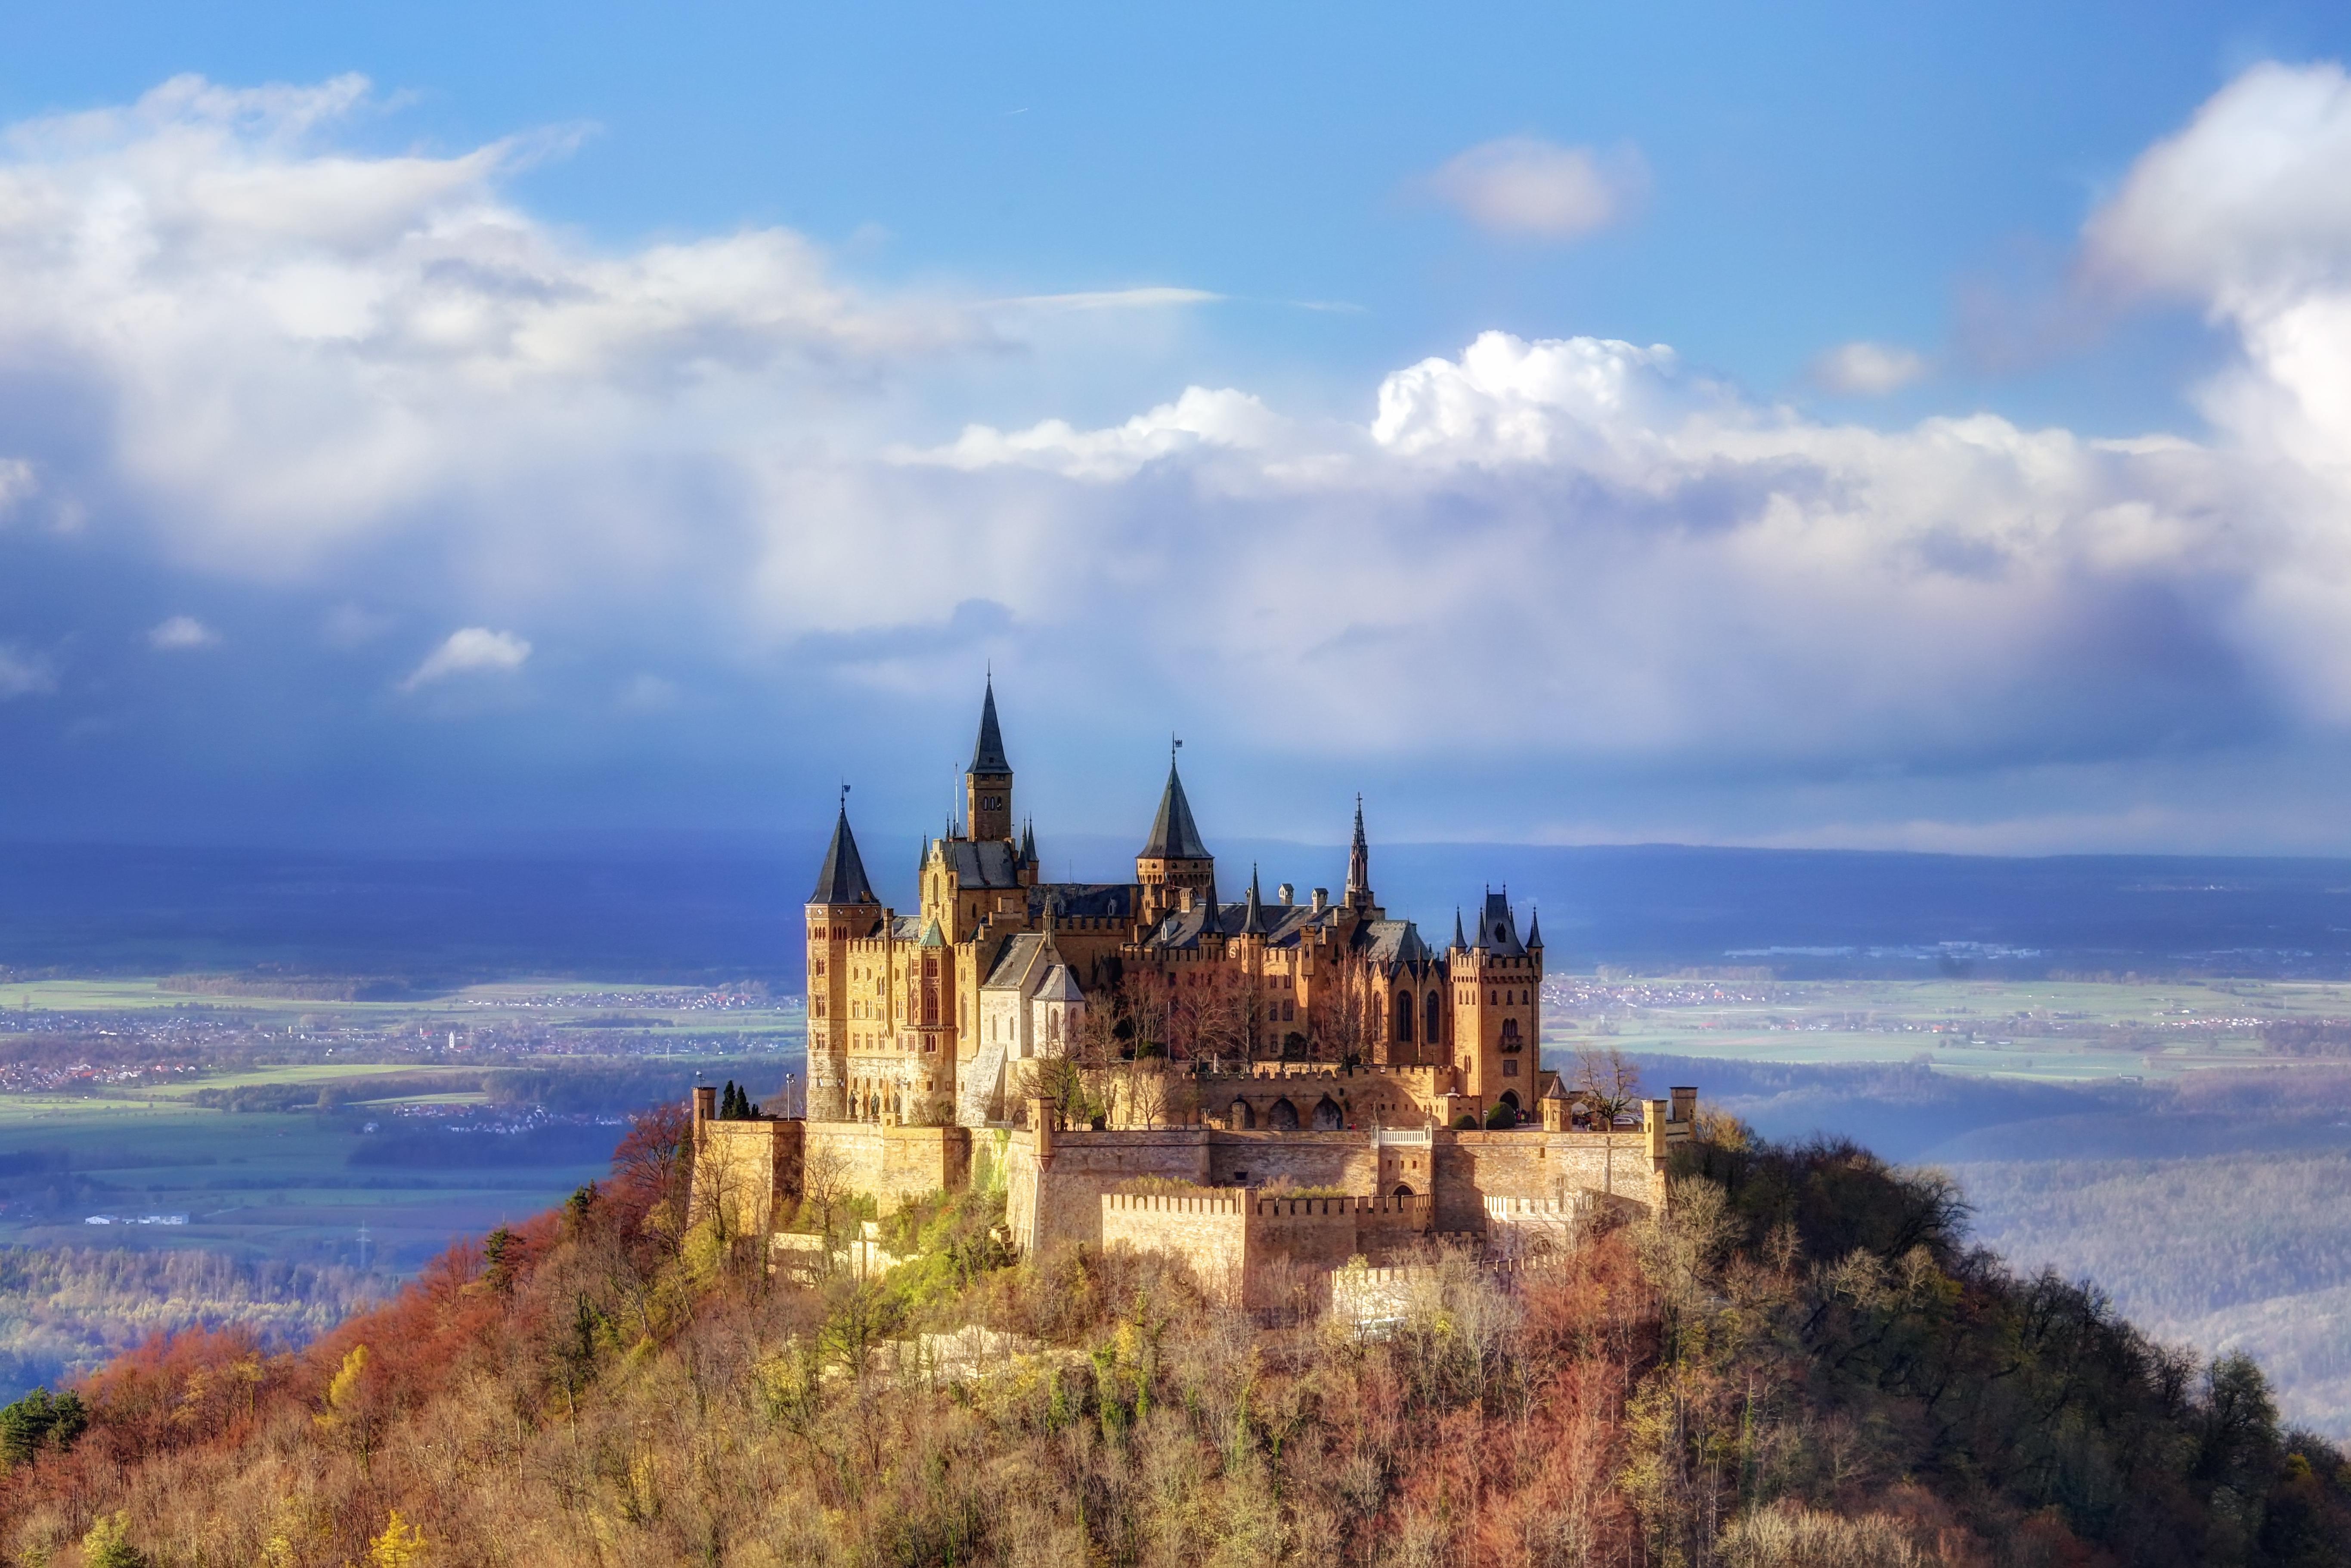 Iphone wallpaper chinese - Burg Hohenzollern 5461x3643 Id 589279